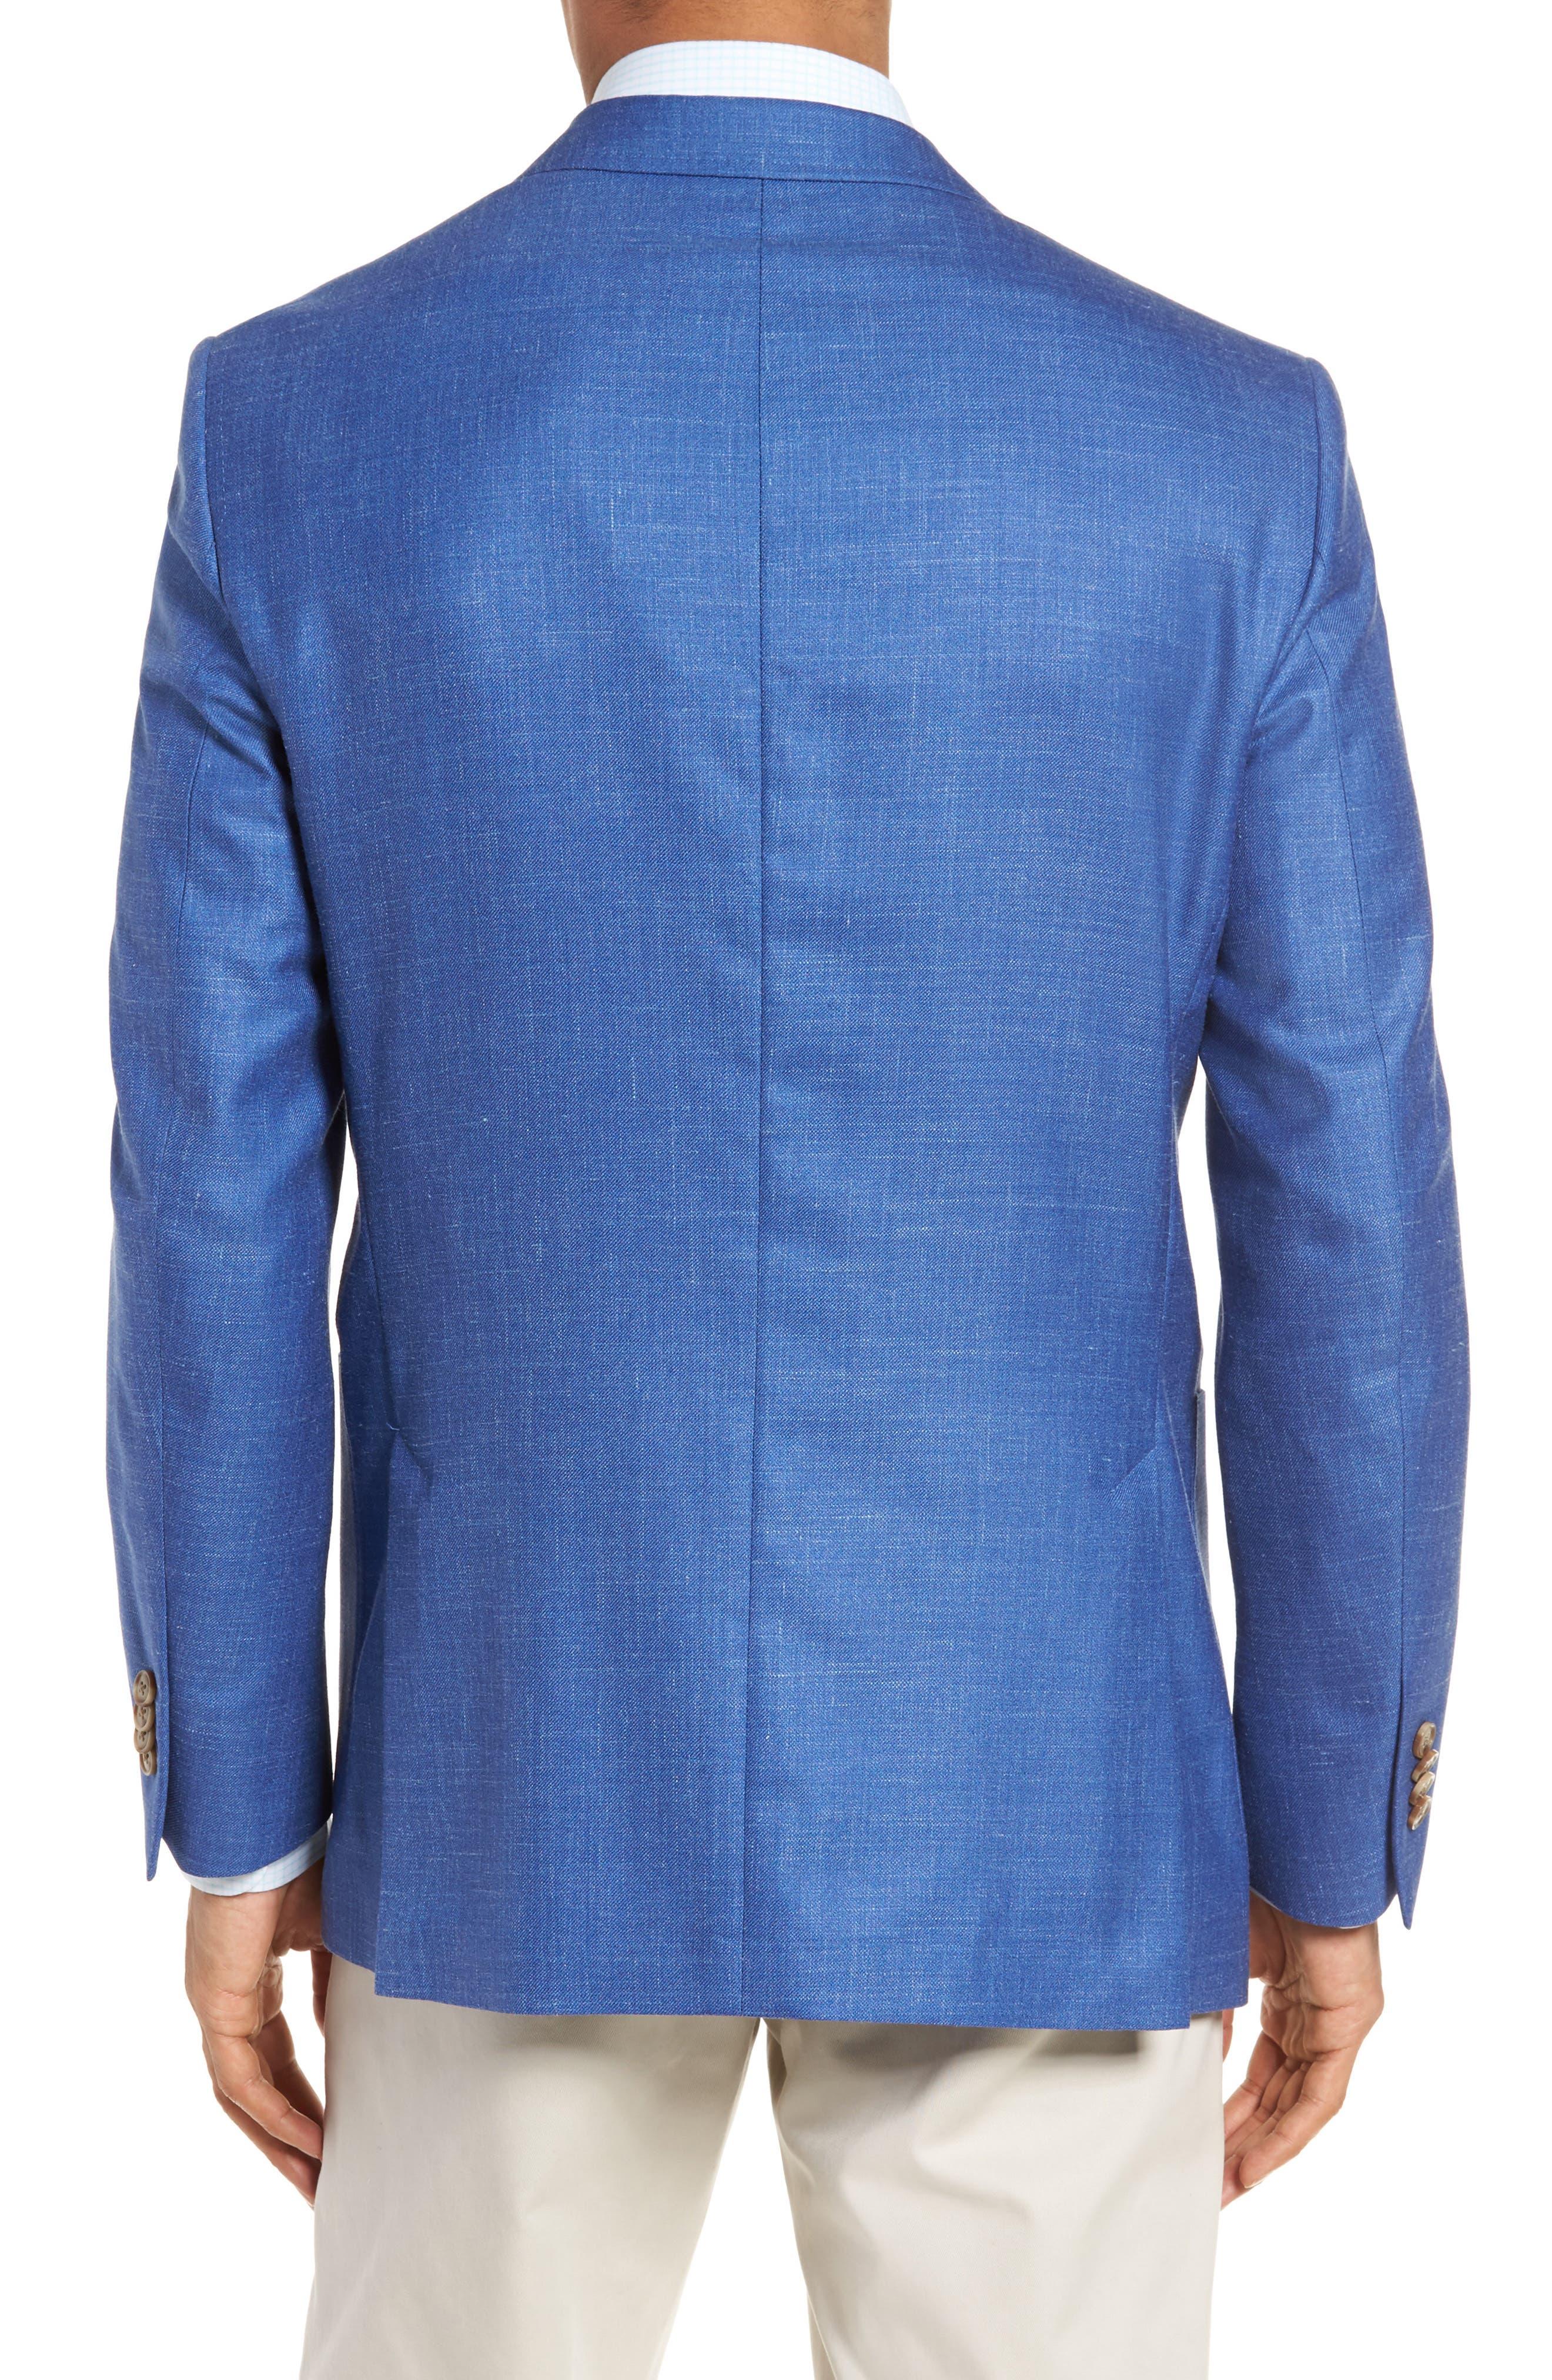 Classic Fit Wool Blend Blazer,                             Alternate thumbnail 2, color,                             Blue